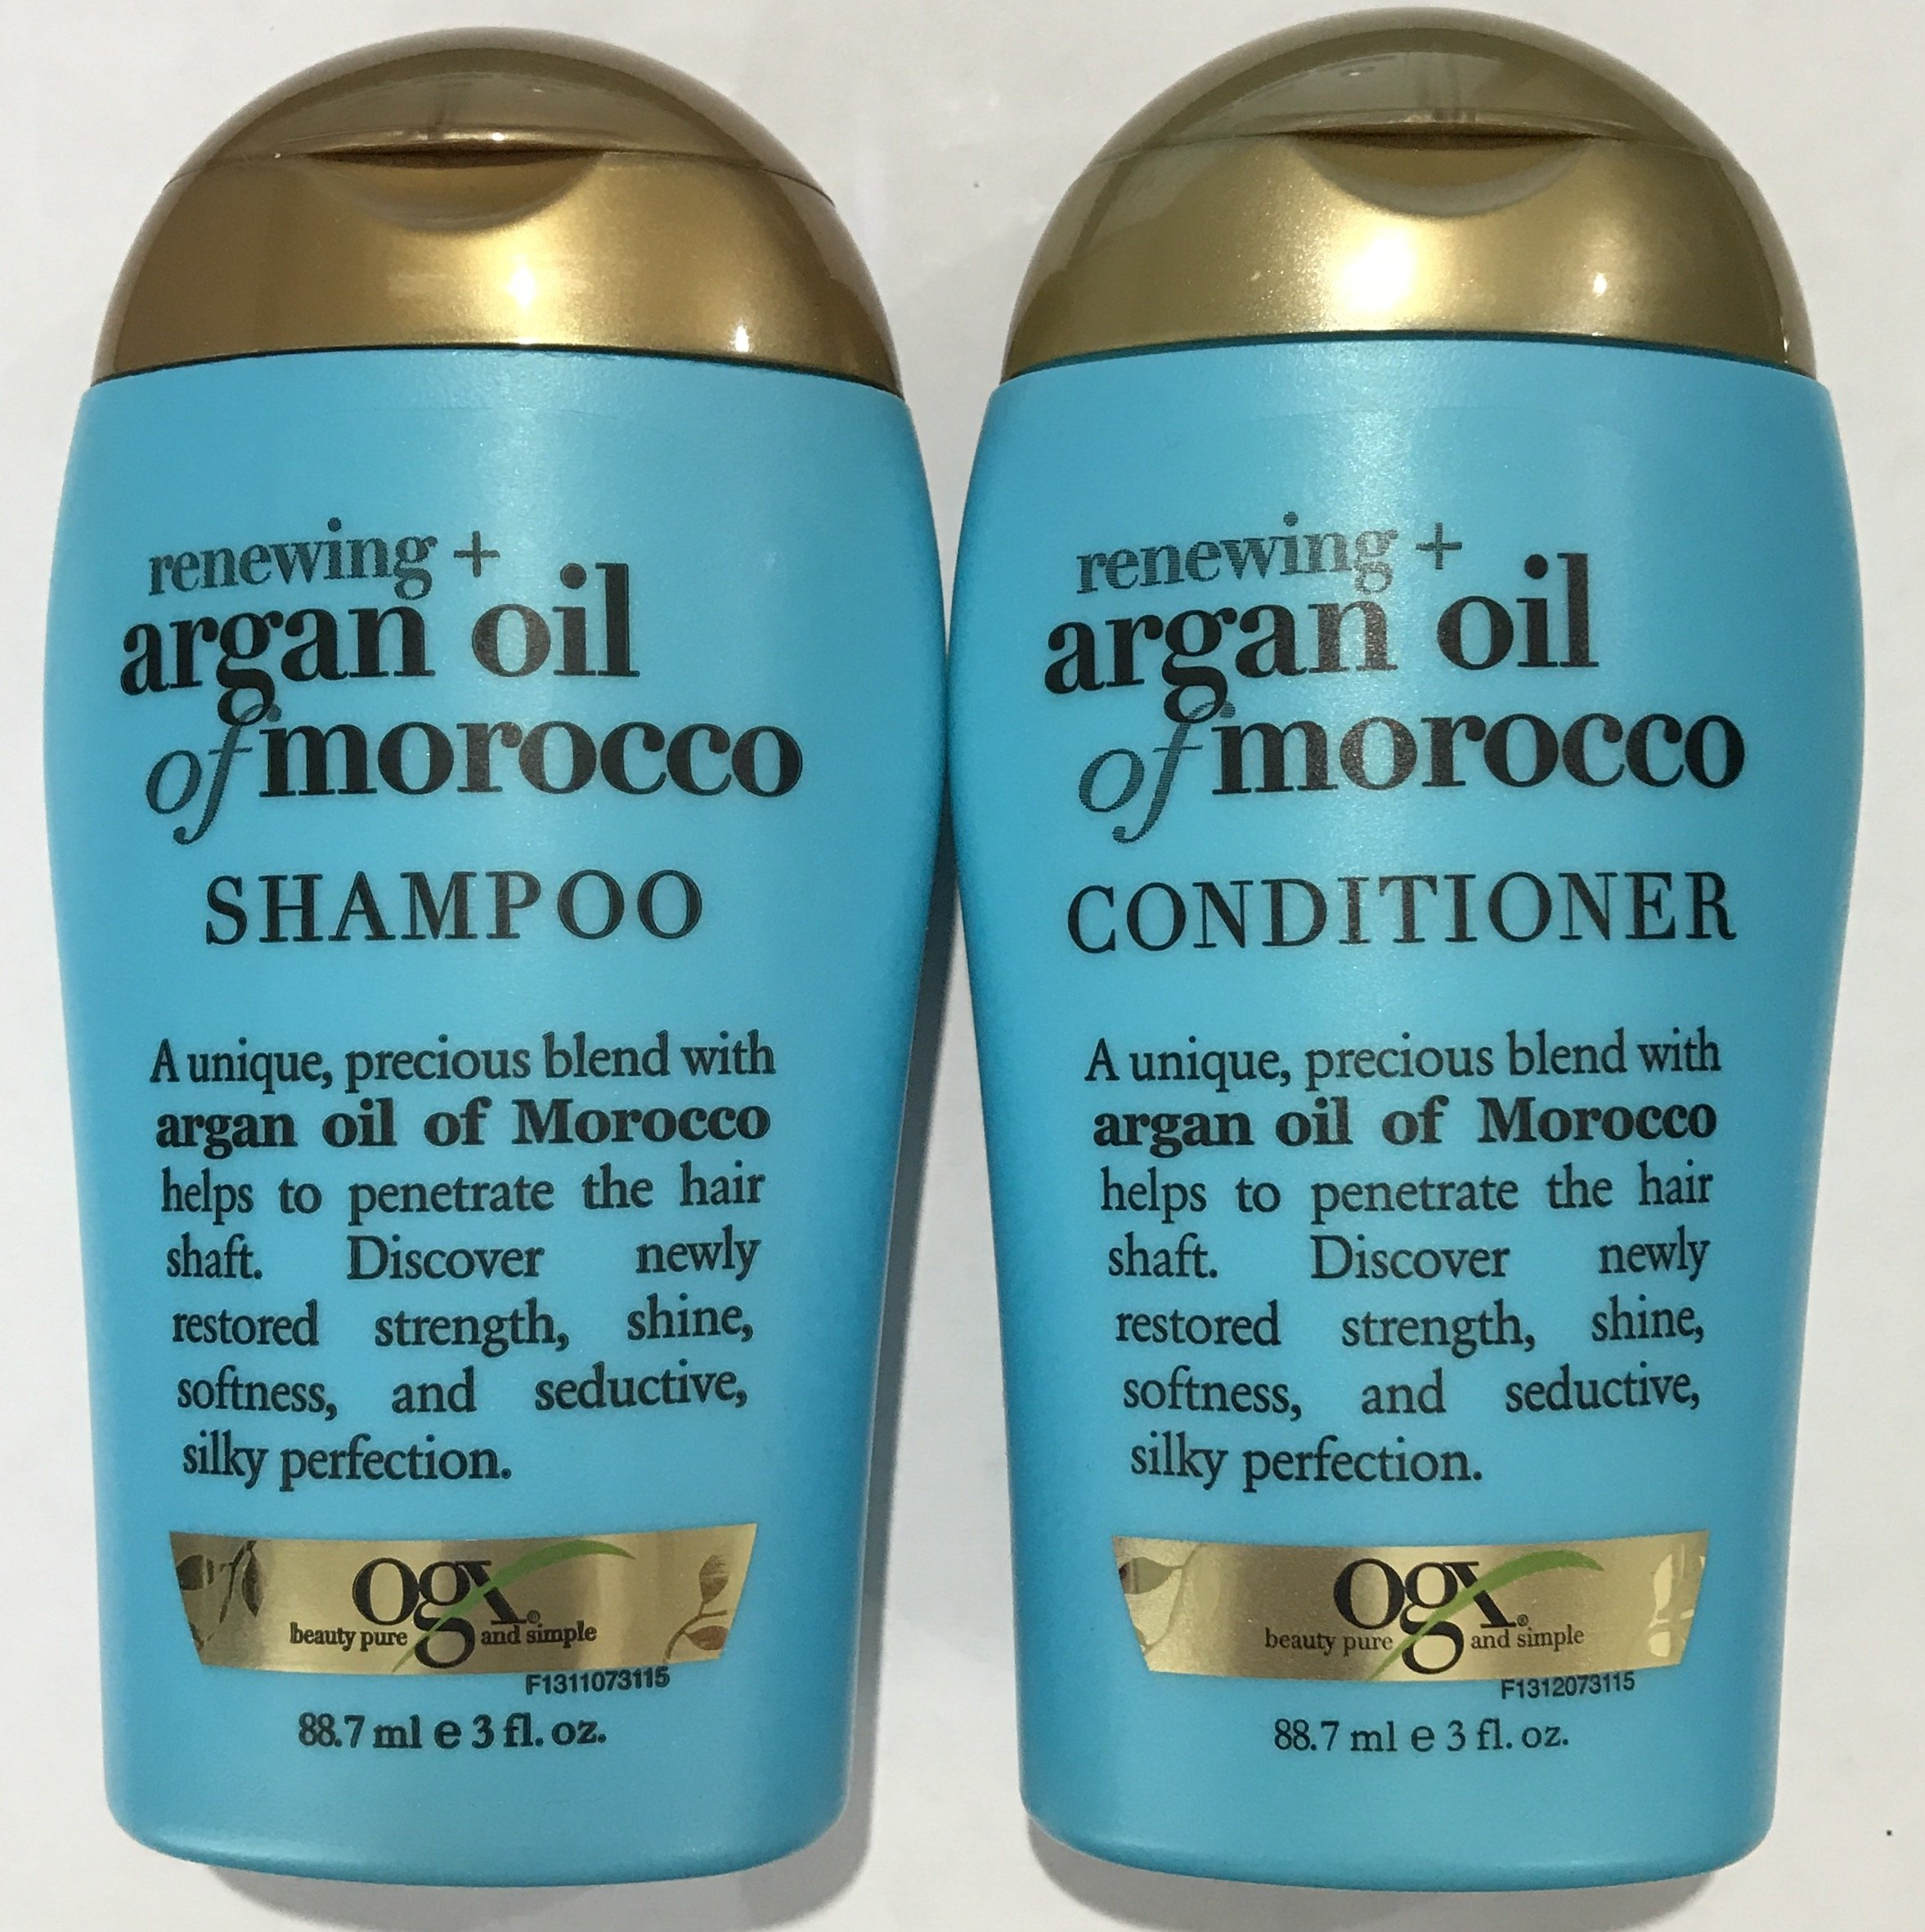 Ogx Renewing Argan Oil of Morocco Shampoo & Conditioner Travel Size - 3 Oz. Each